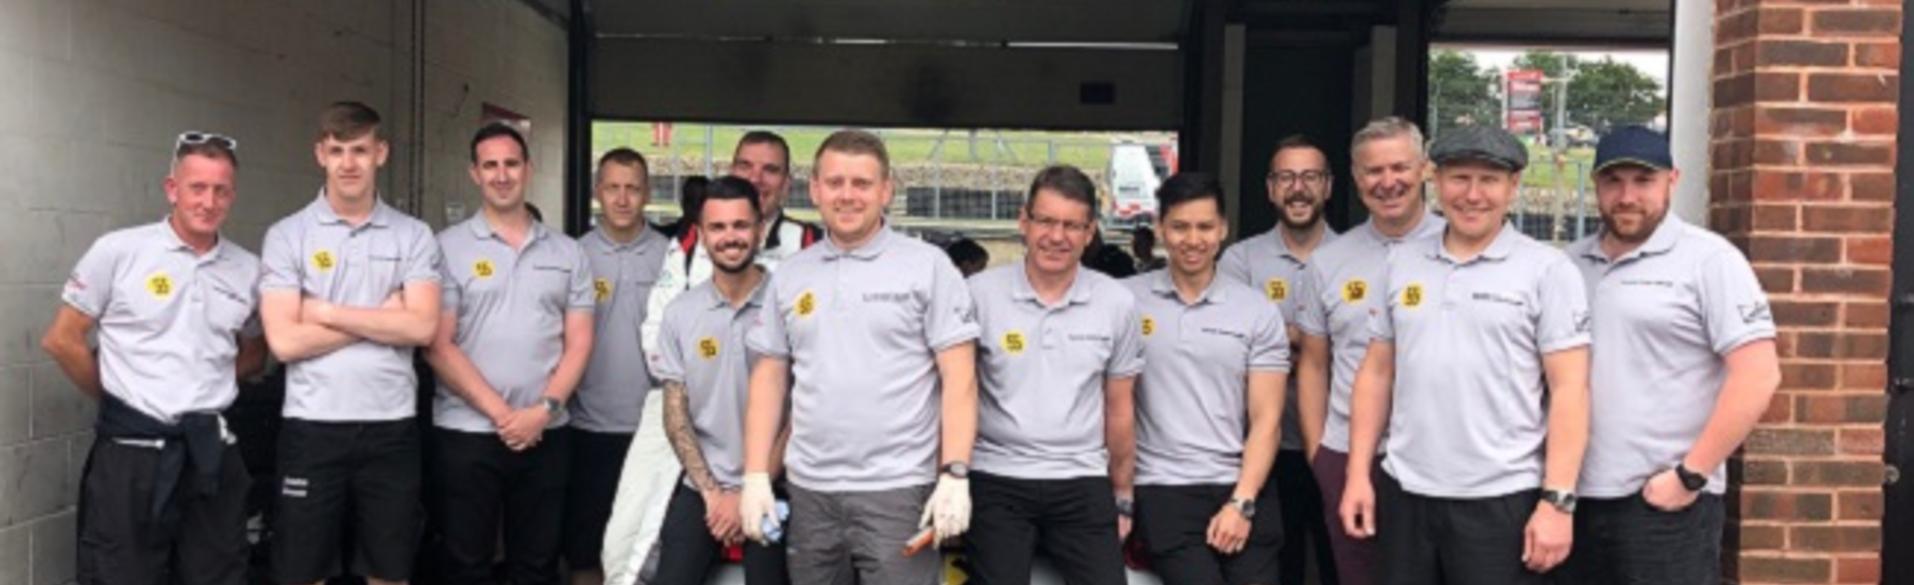 Porsche Centre Cardiff Support